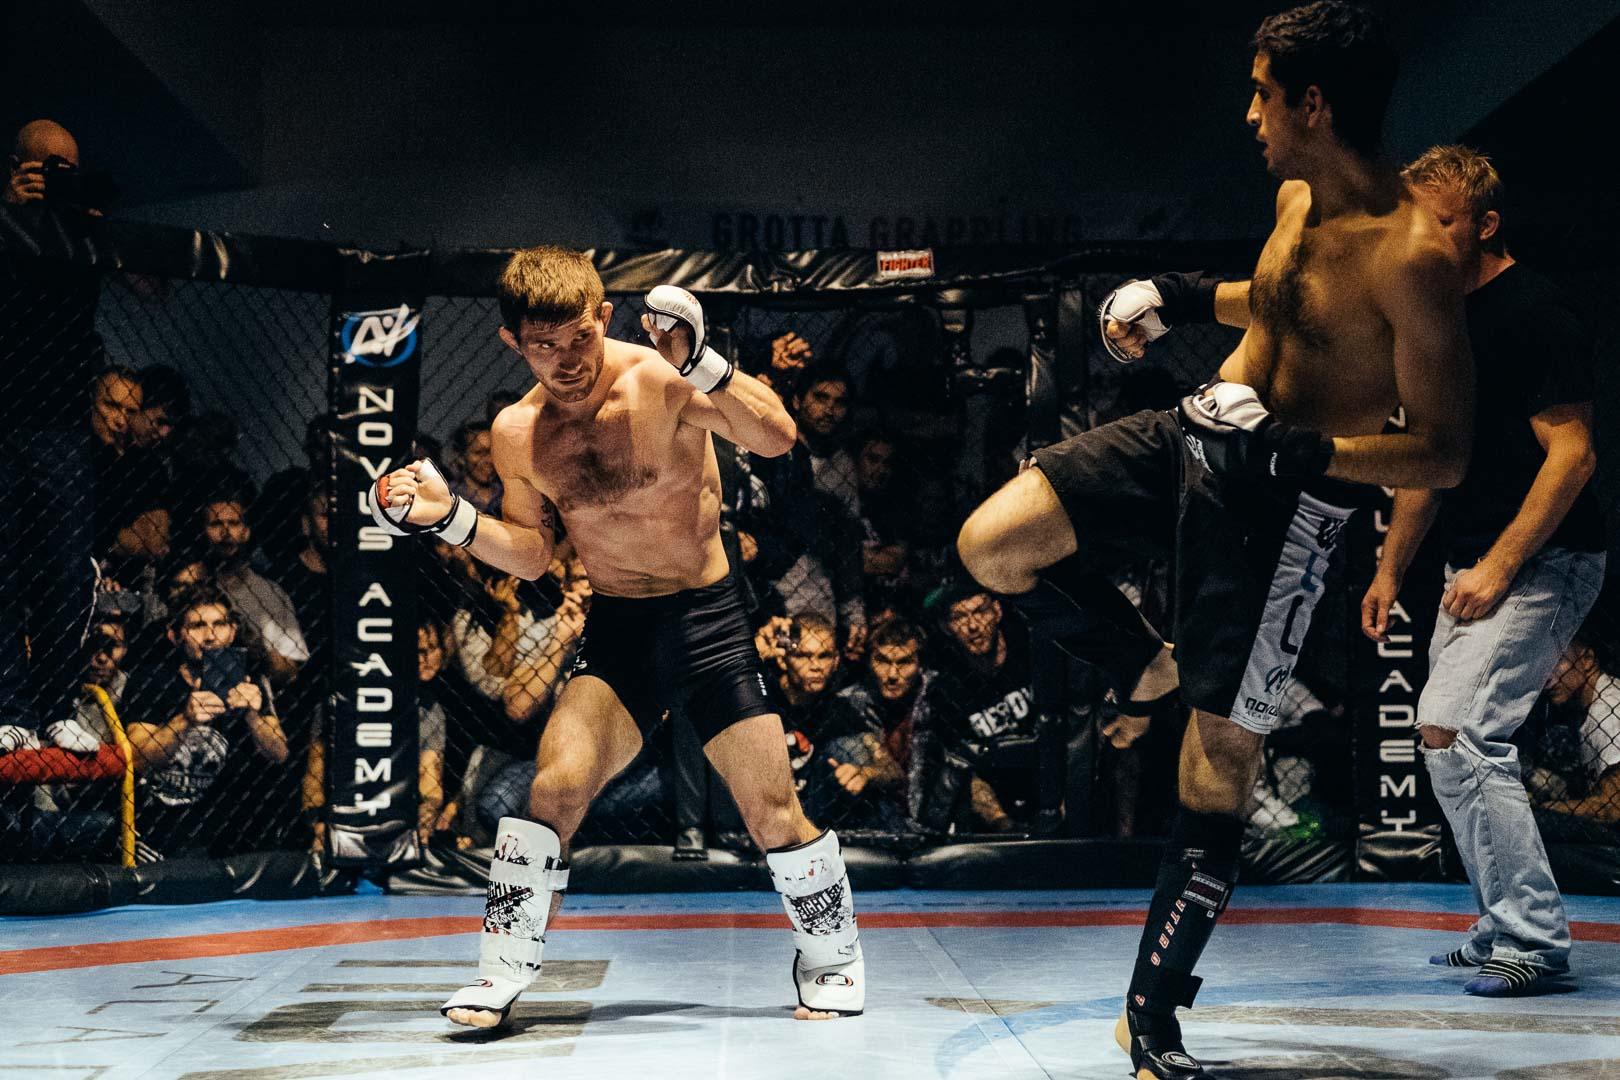 Anders Rønningen MMA kamp.jpg